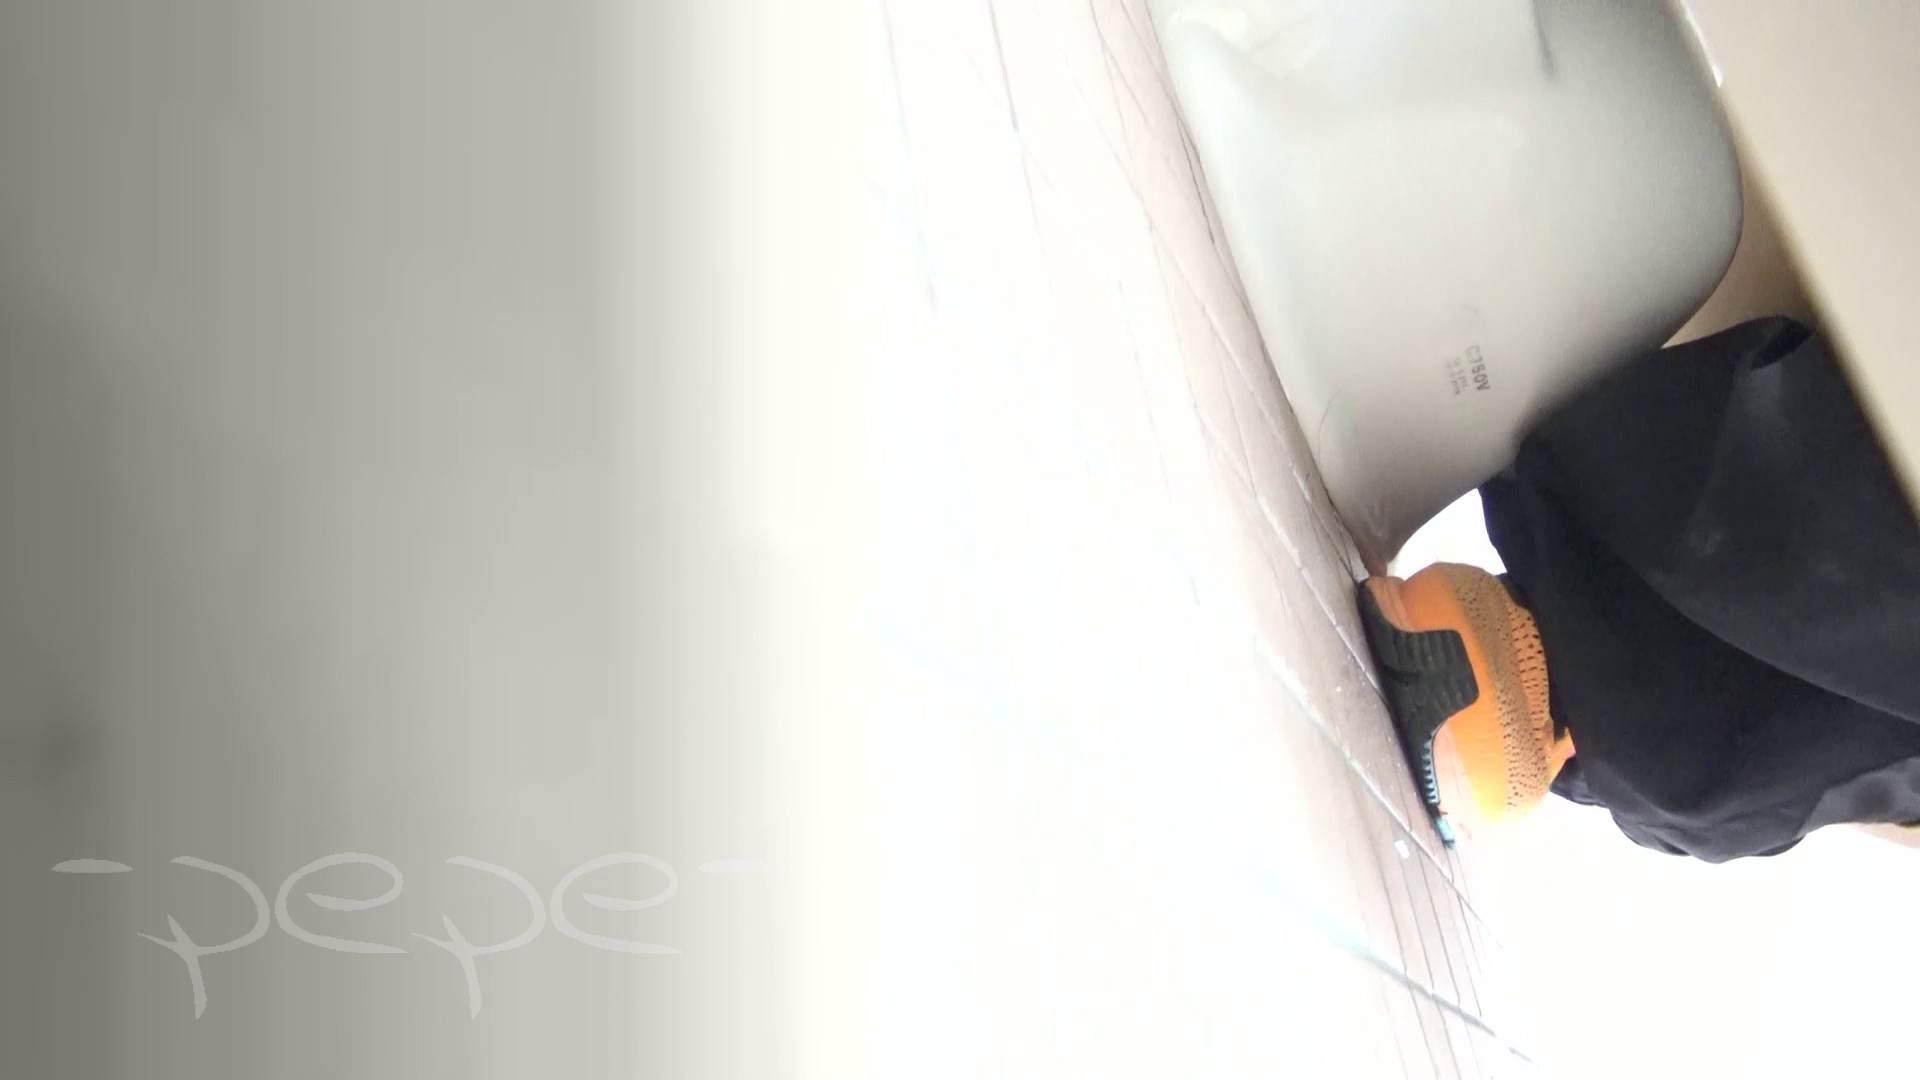 ▲期間限定D▲至高洗面所盗撮 27 体育館 局部好きの為の下方撮り特集!!05 洗面所  112pic 64